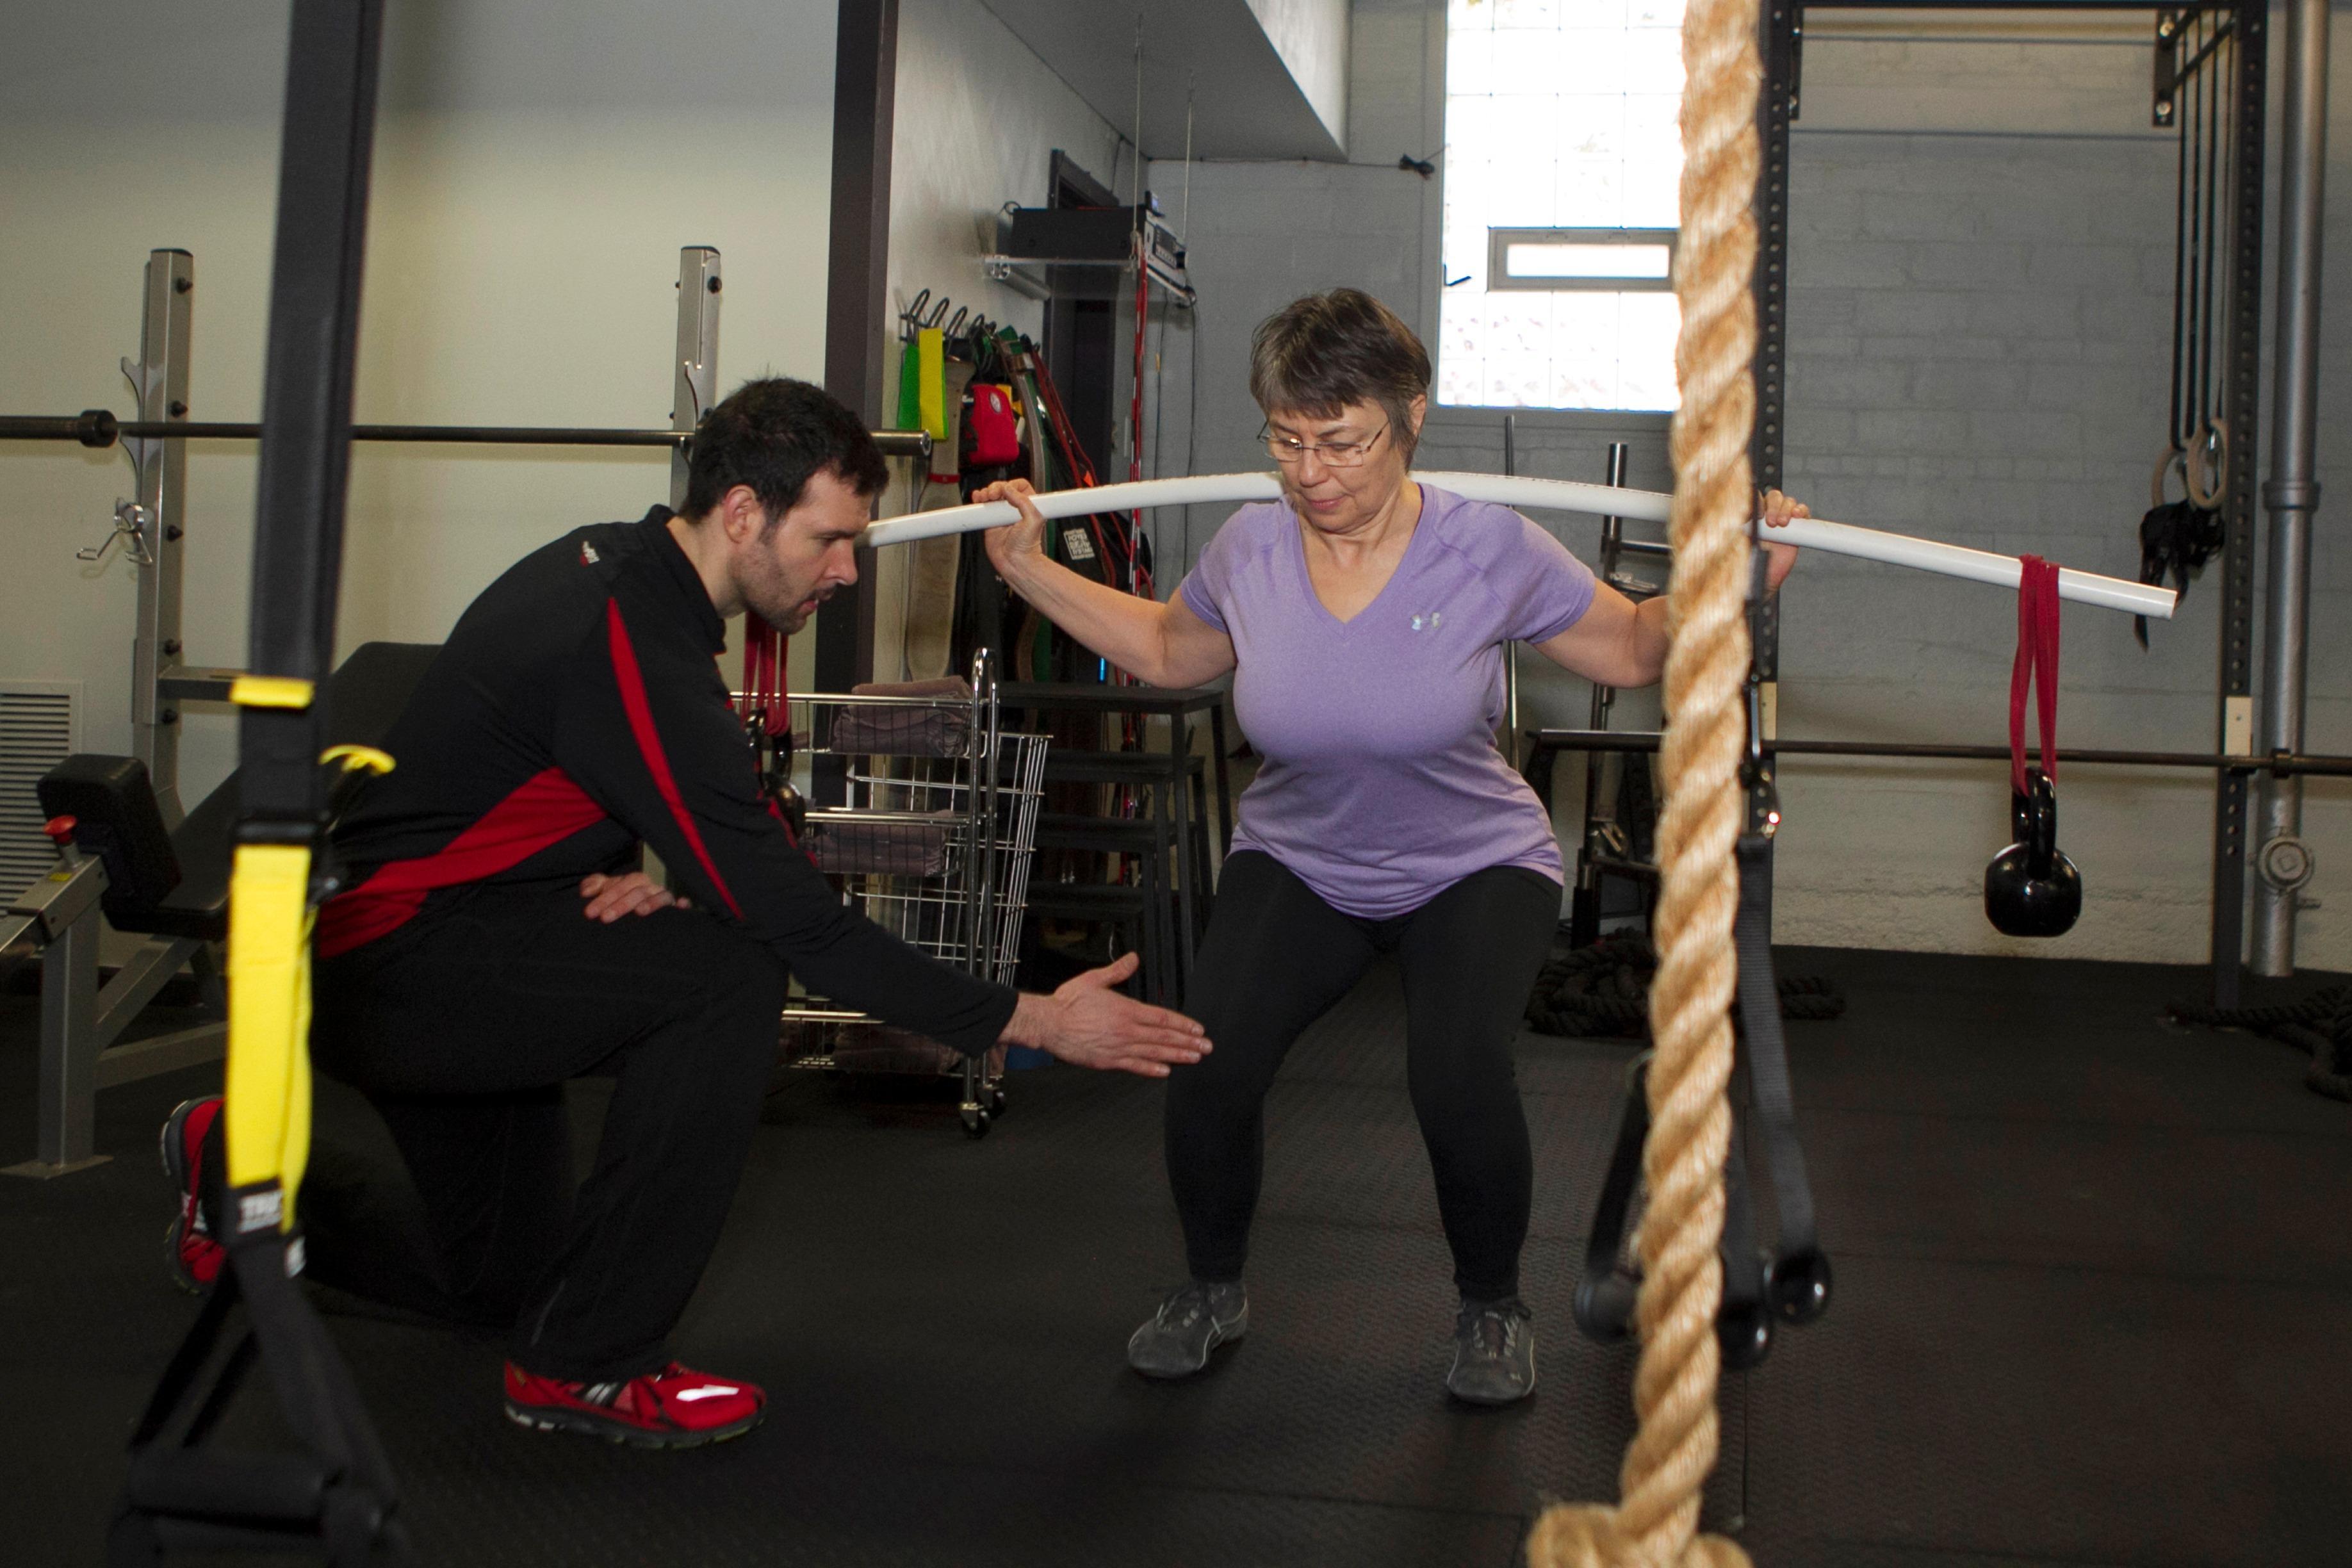 Fierce Fitness LLC image 2